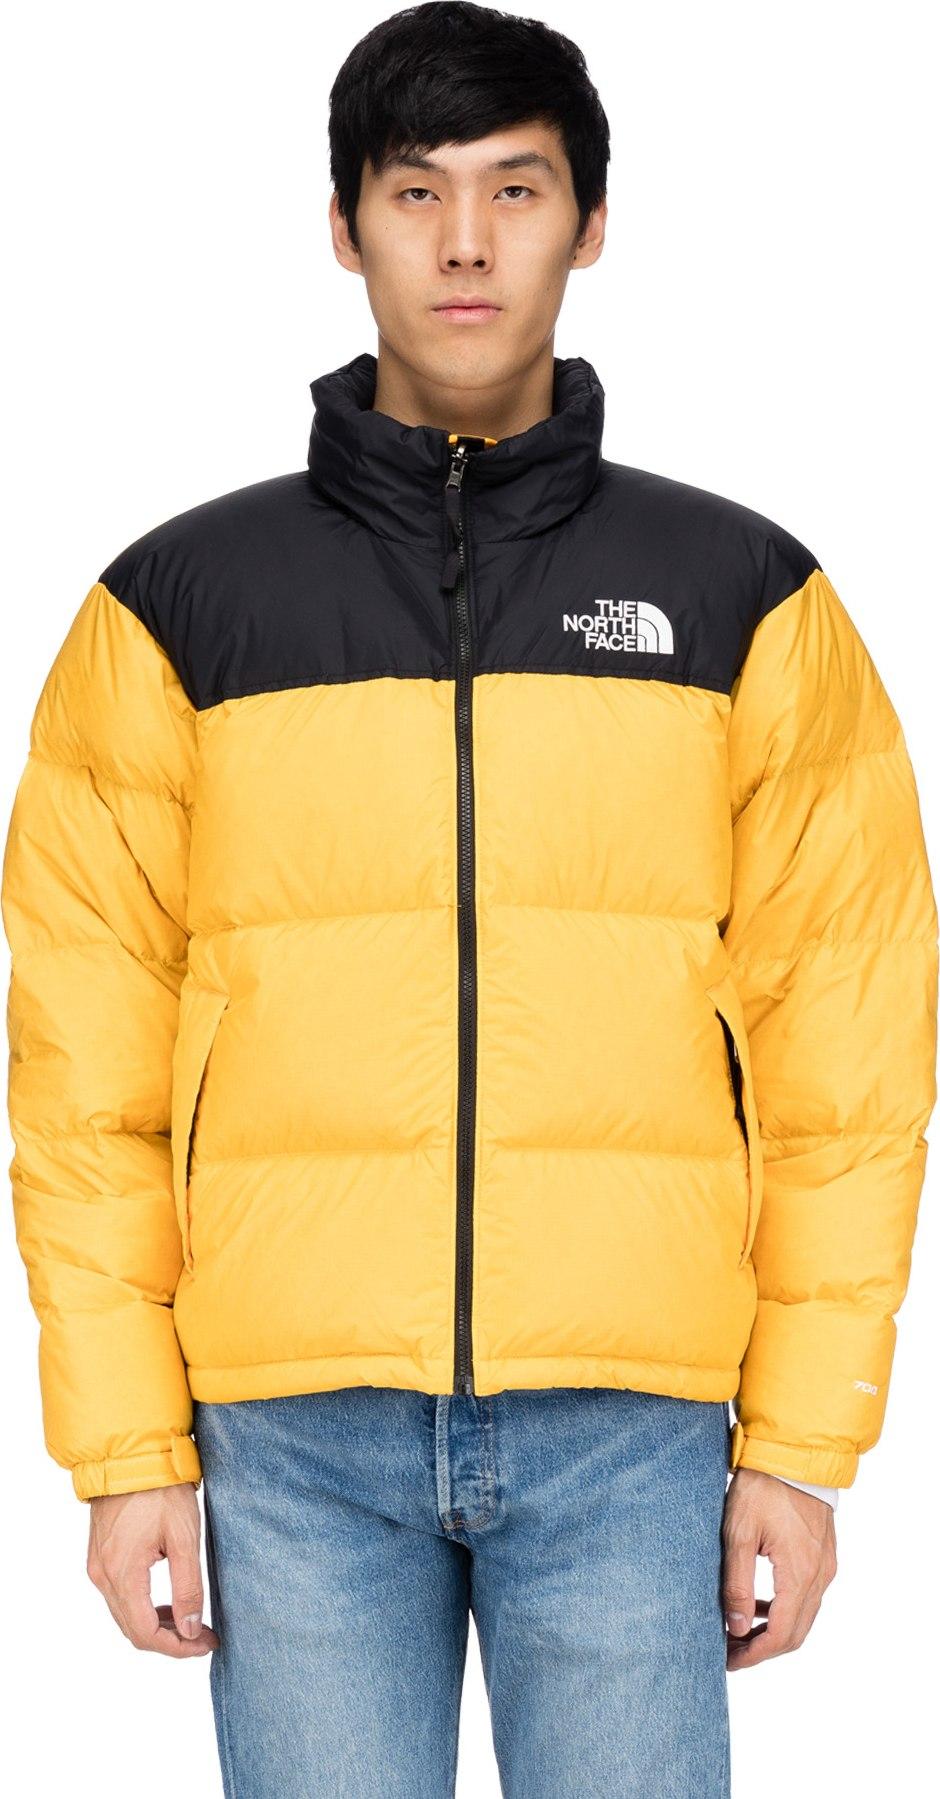 ee1f7267a The North Face - 1996 Retro Nuptse Jacket - TNF Yellow